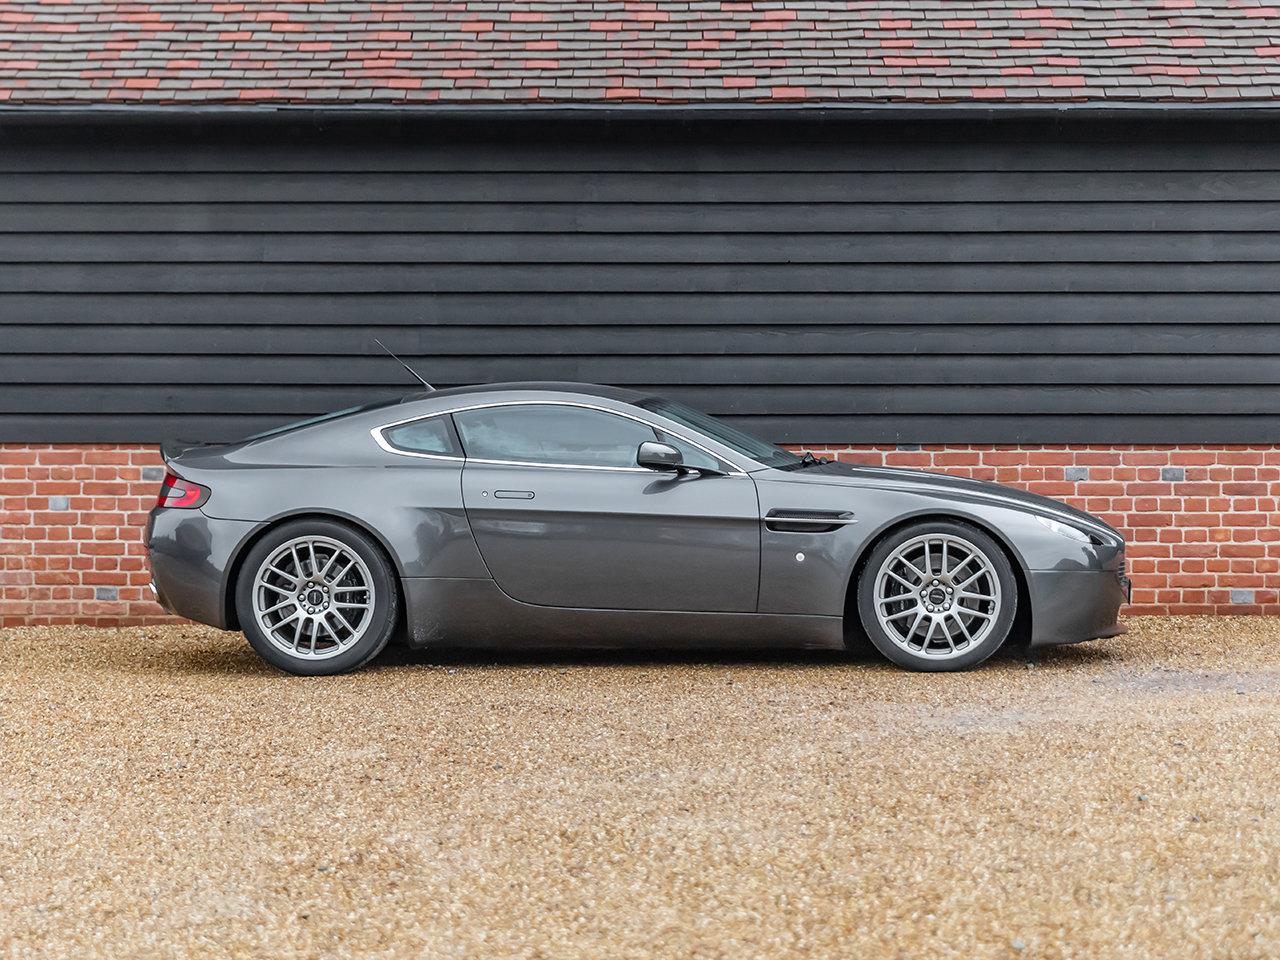 2006 Aston Martin V8 Vantage - Prodrive  For Sale (picture 2 of 6)